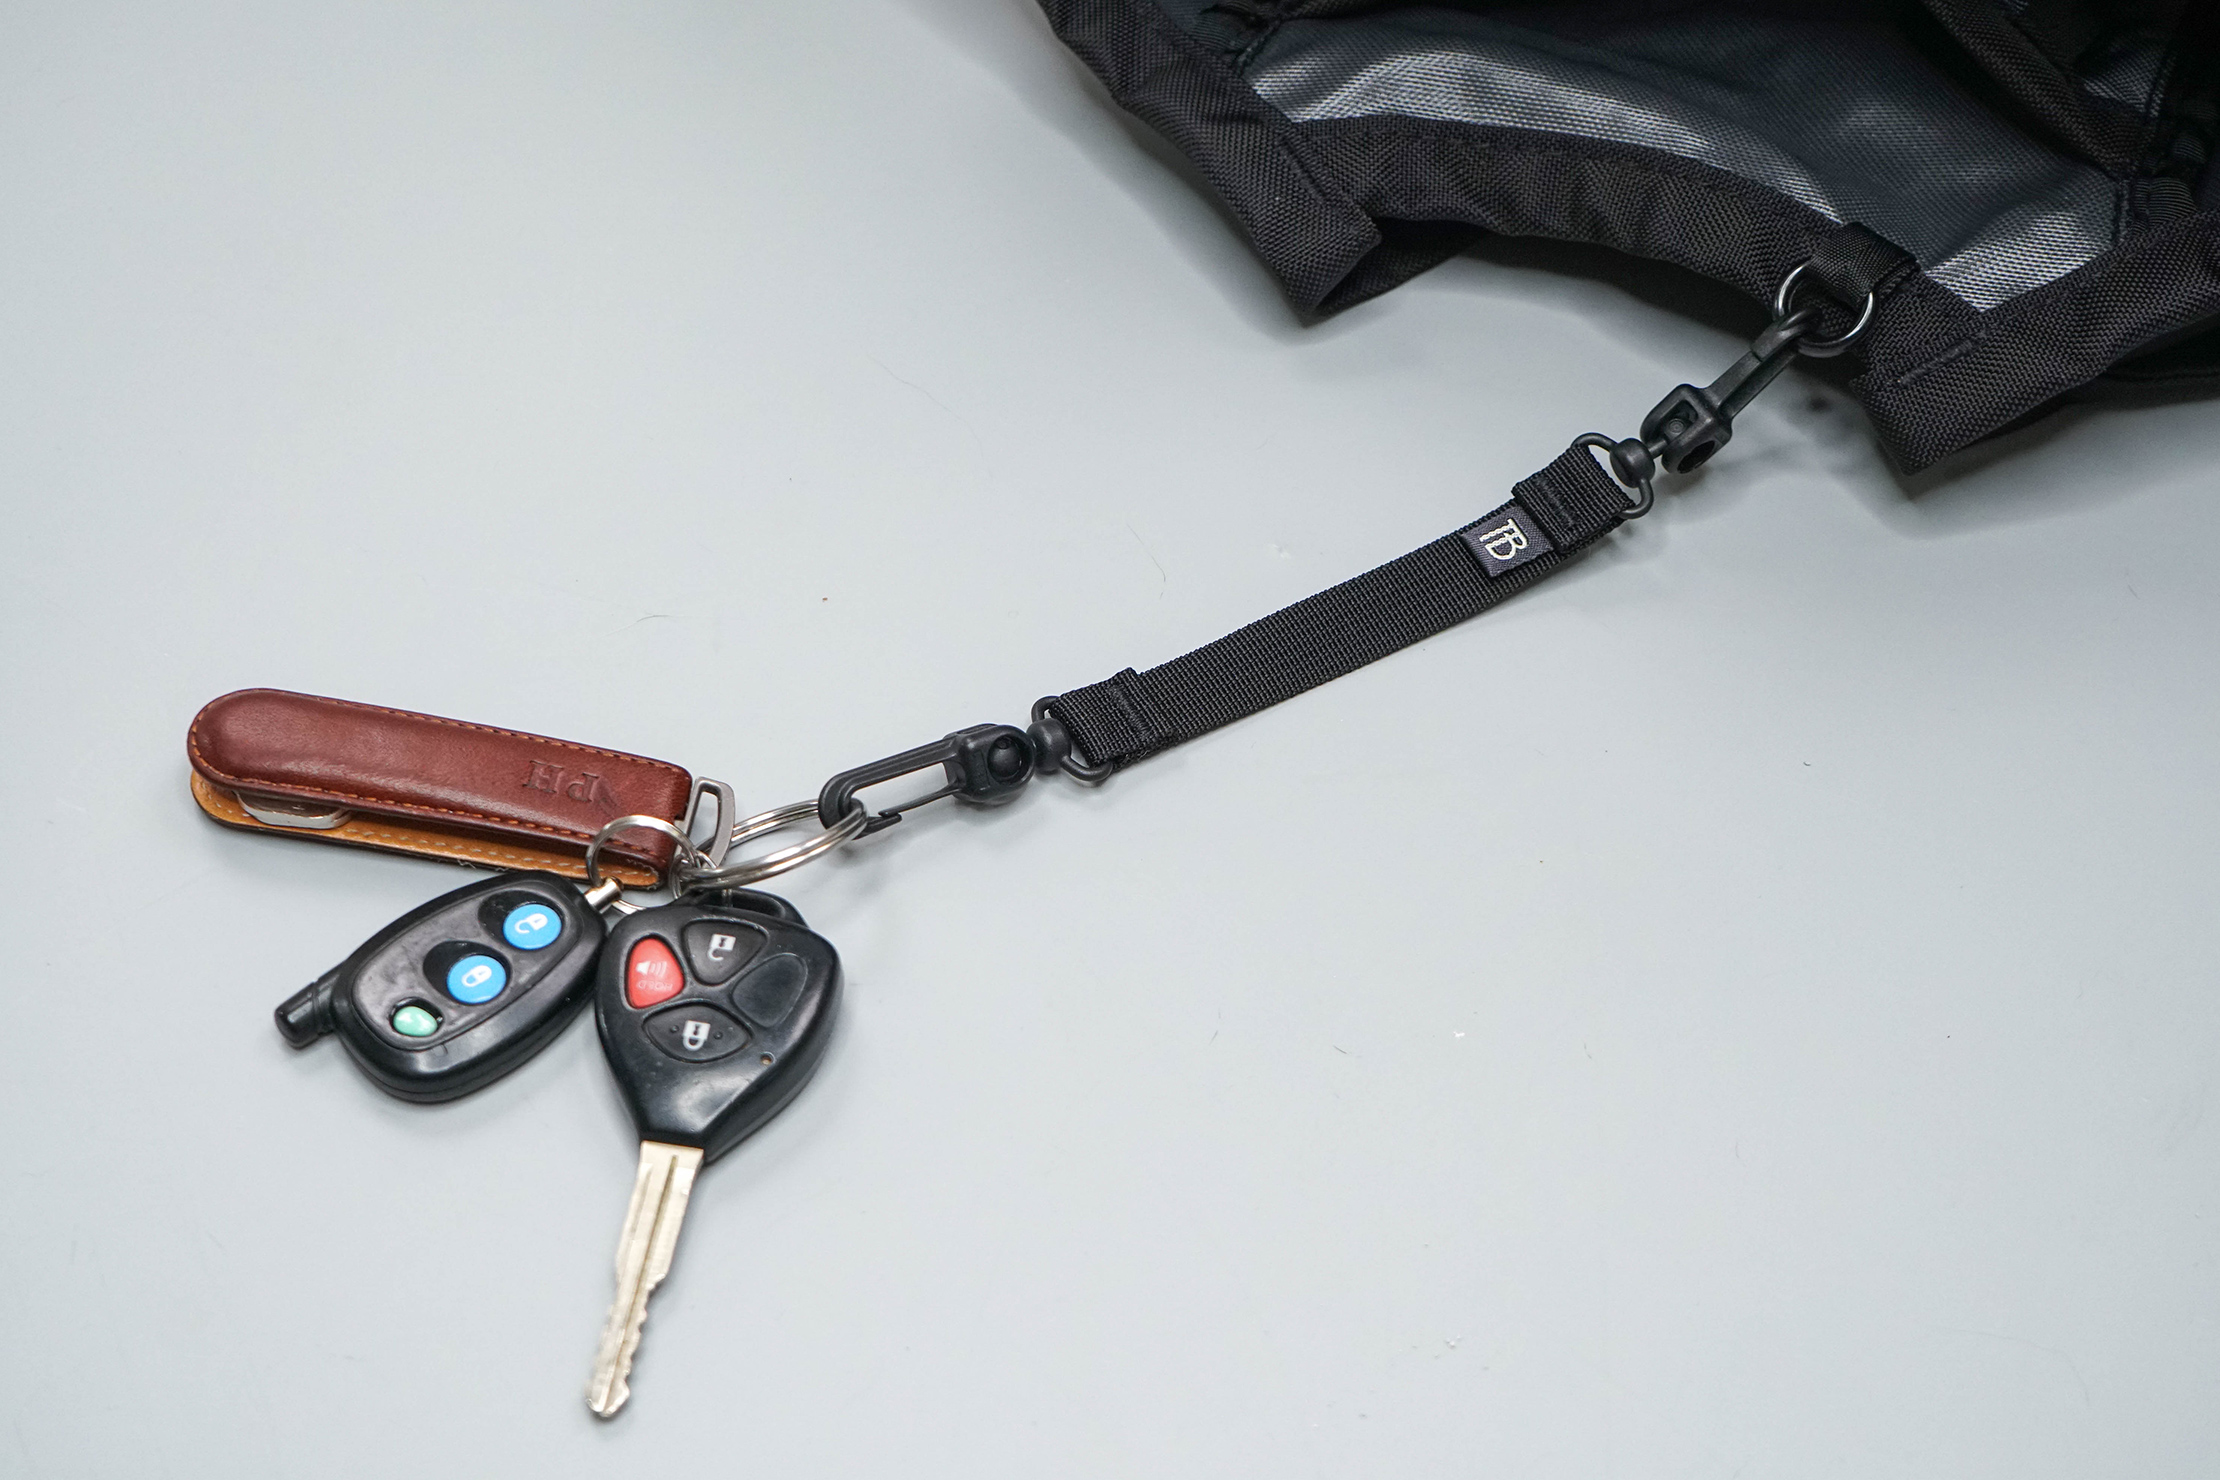 Tom Bihn Pick-Up Truck Key Strap